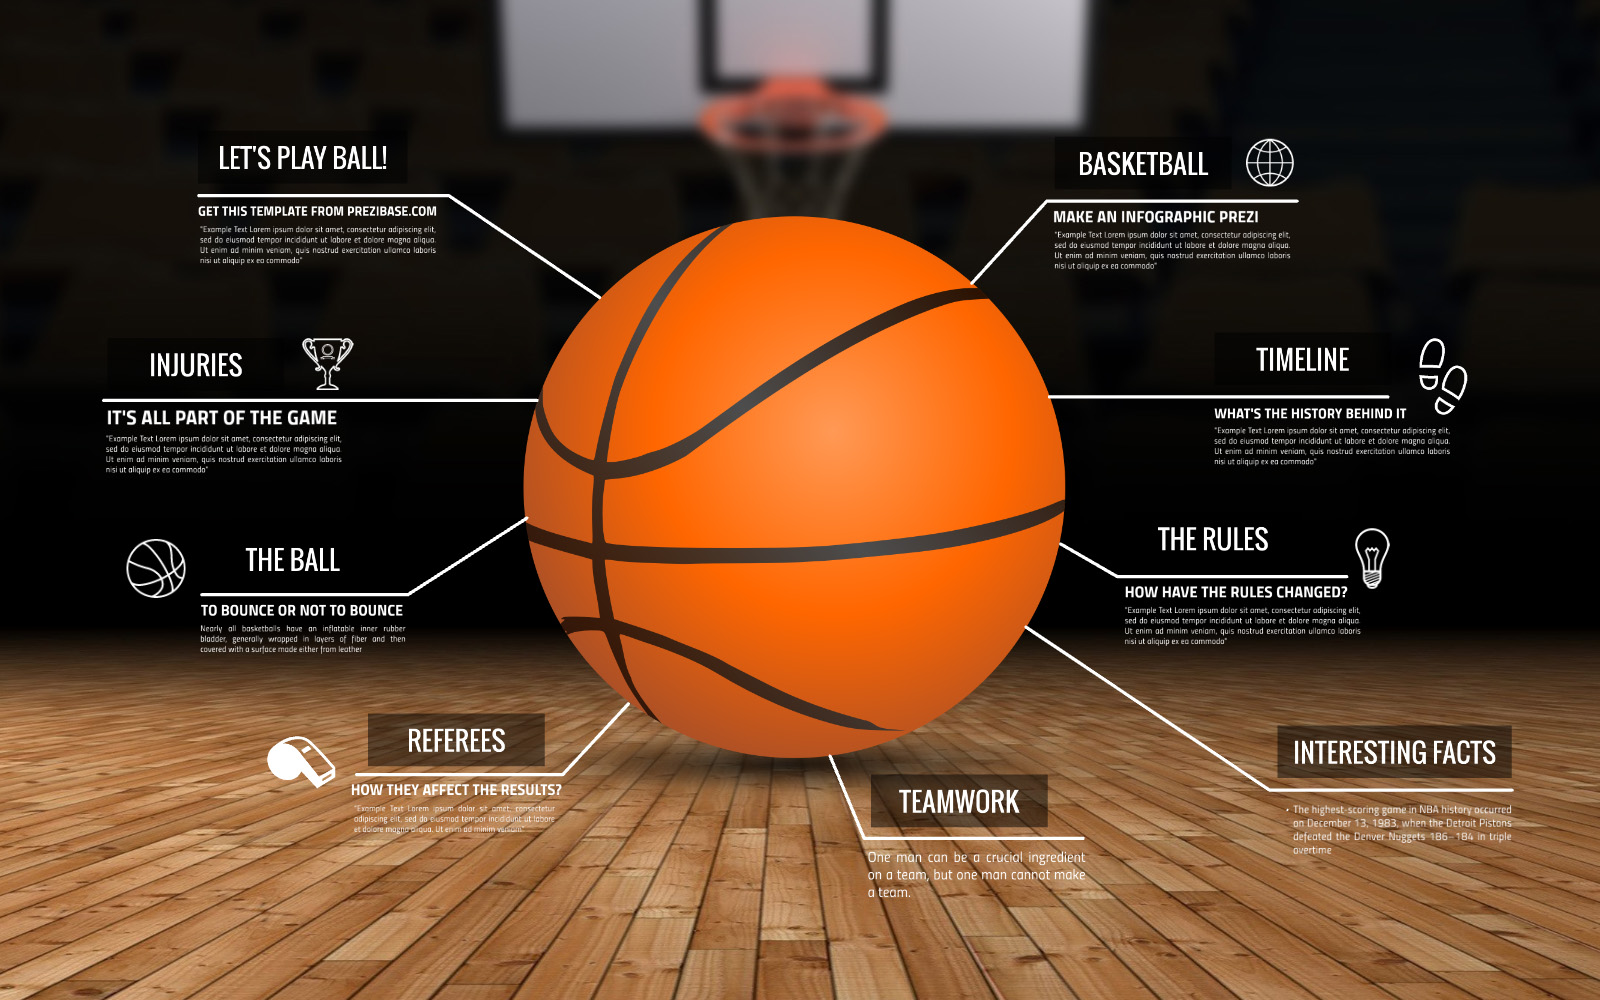 basketball court diagram with notes hitachi 24v alternator wiring infographic prezi template prezibase